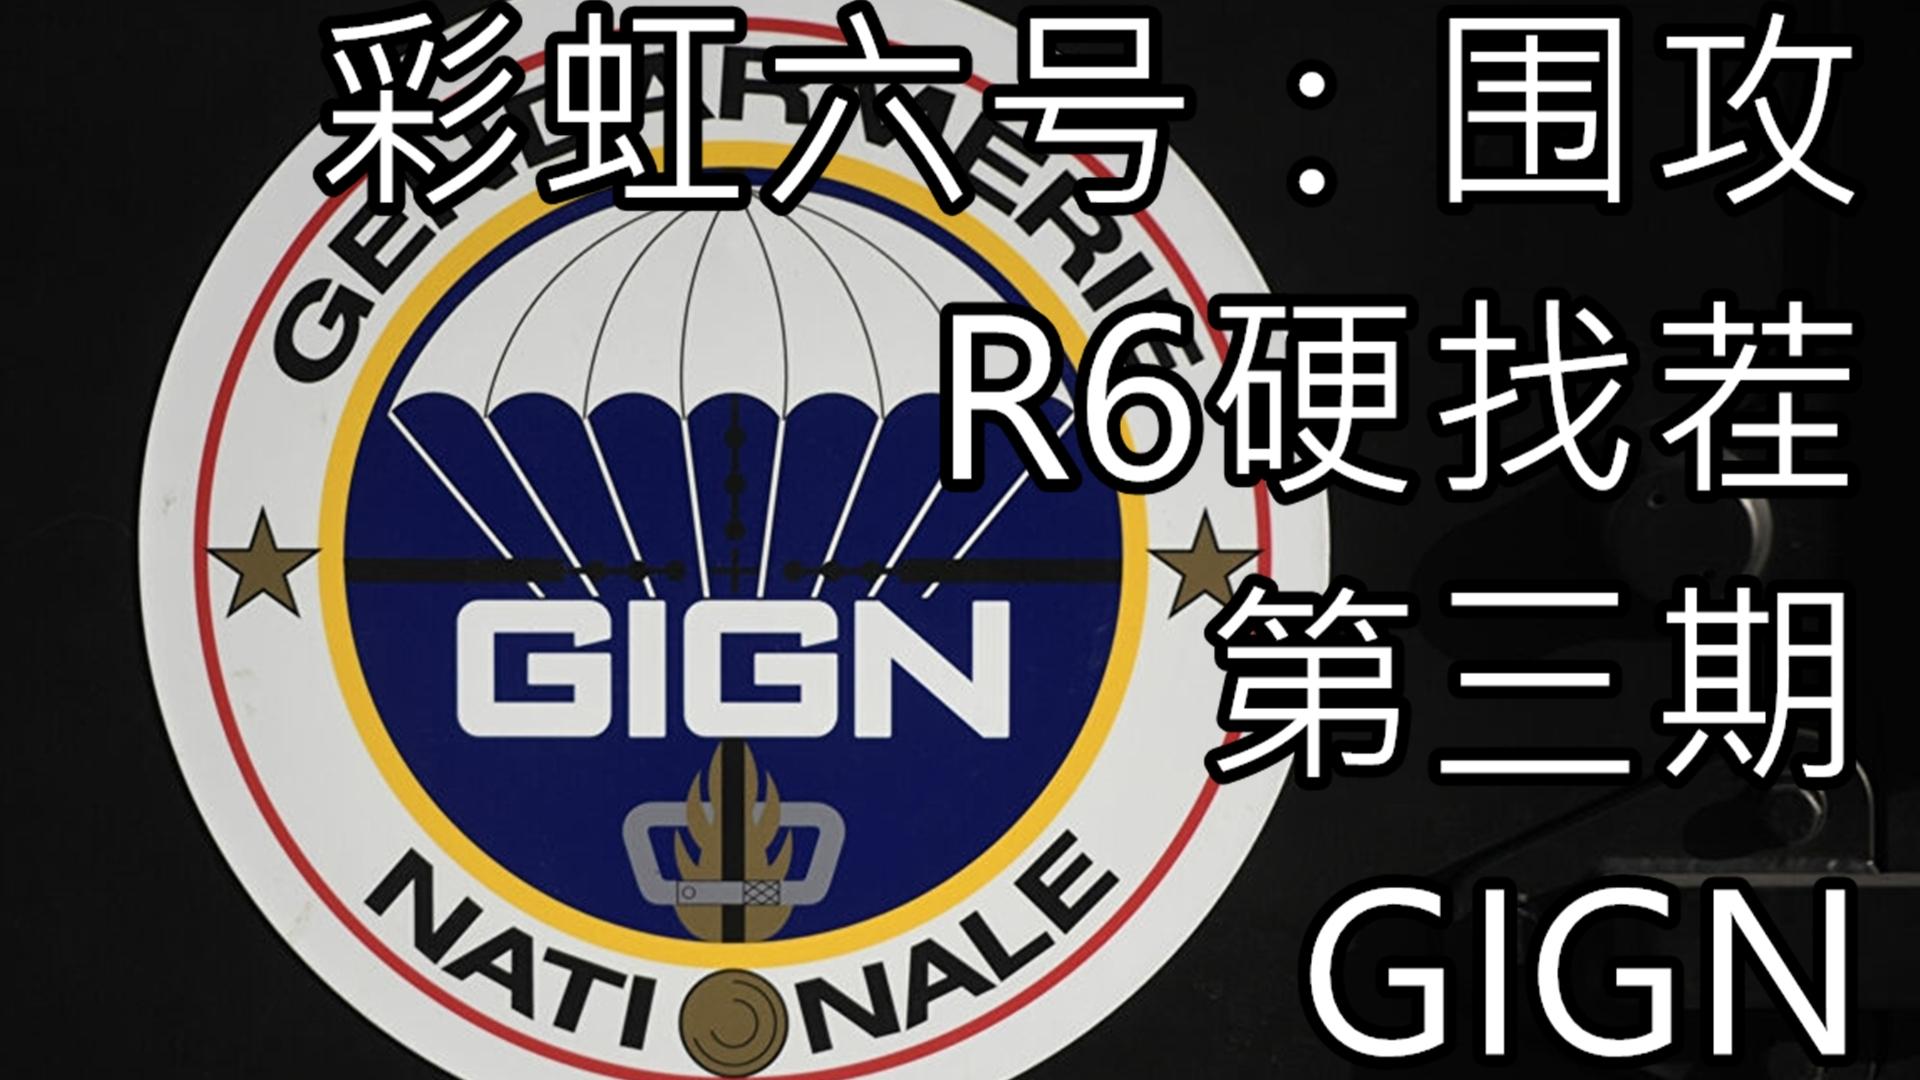 【R6硬找茬】第三期 GIGN(法国国家宪兵特勤队)